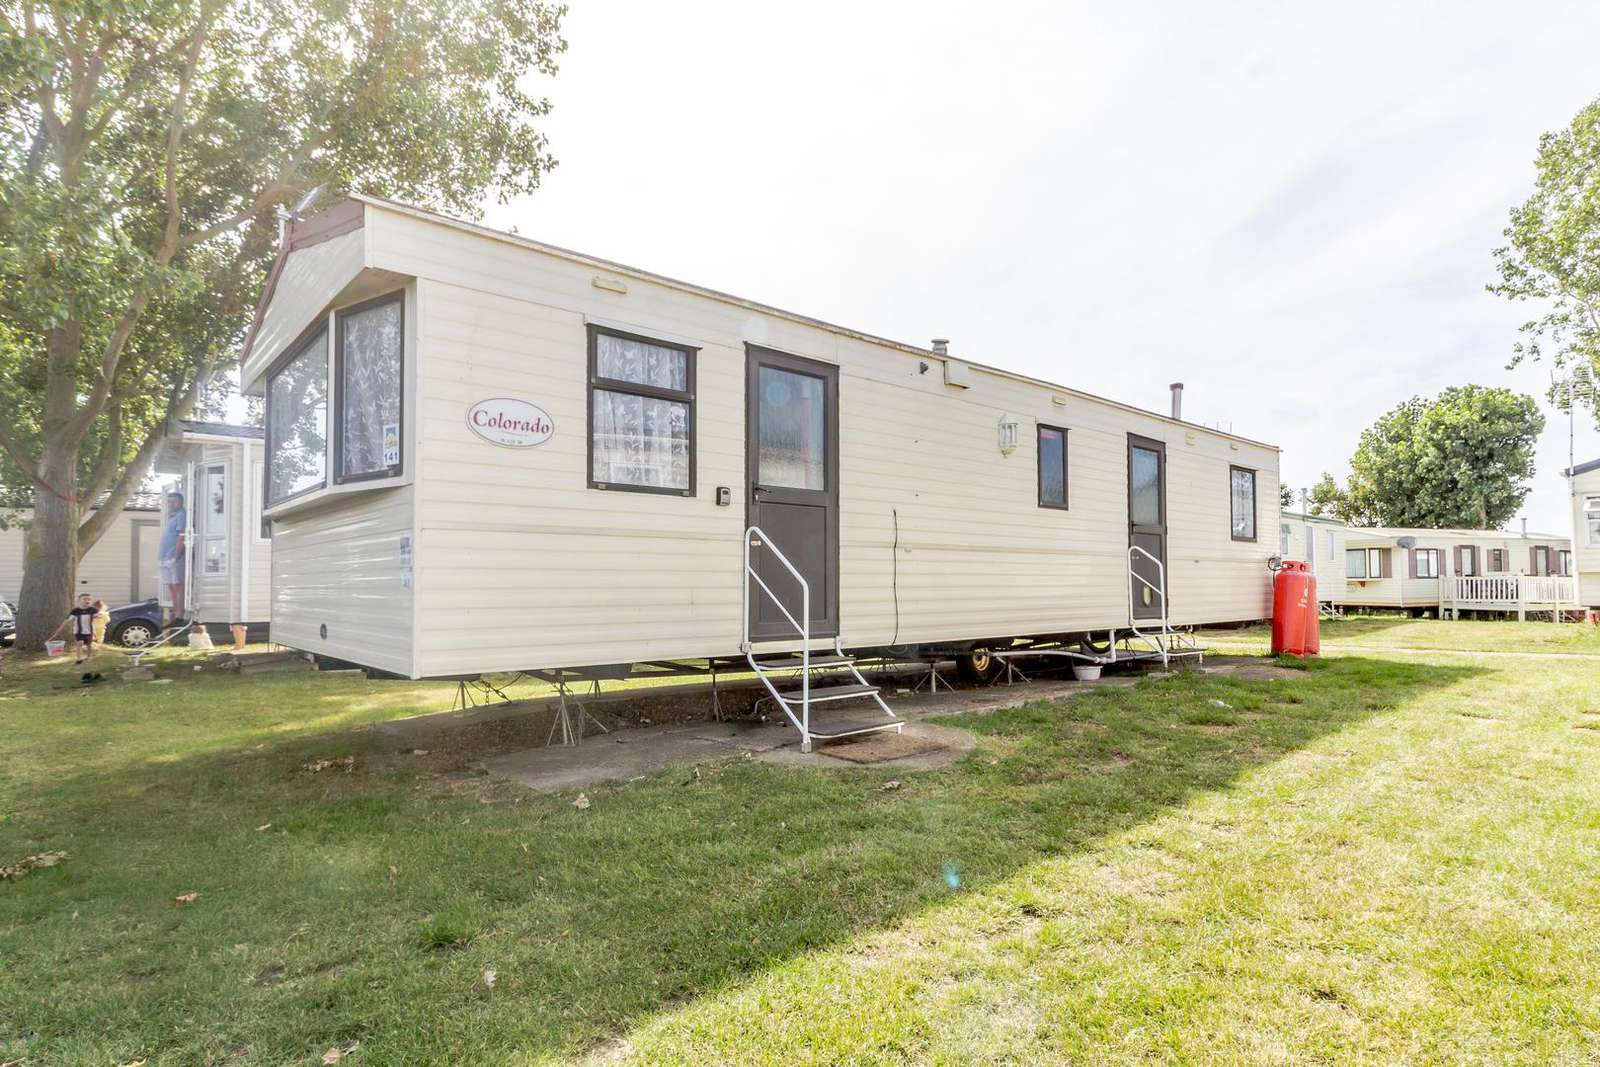 27141S – Seawick, 3 bed, 8 berth caravan close to park amenities. Emerald rated. - property